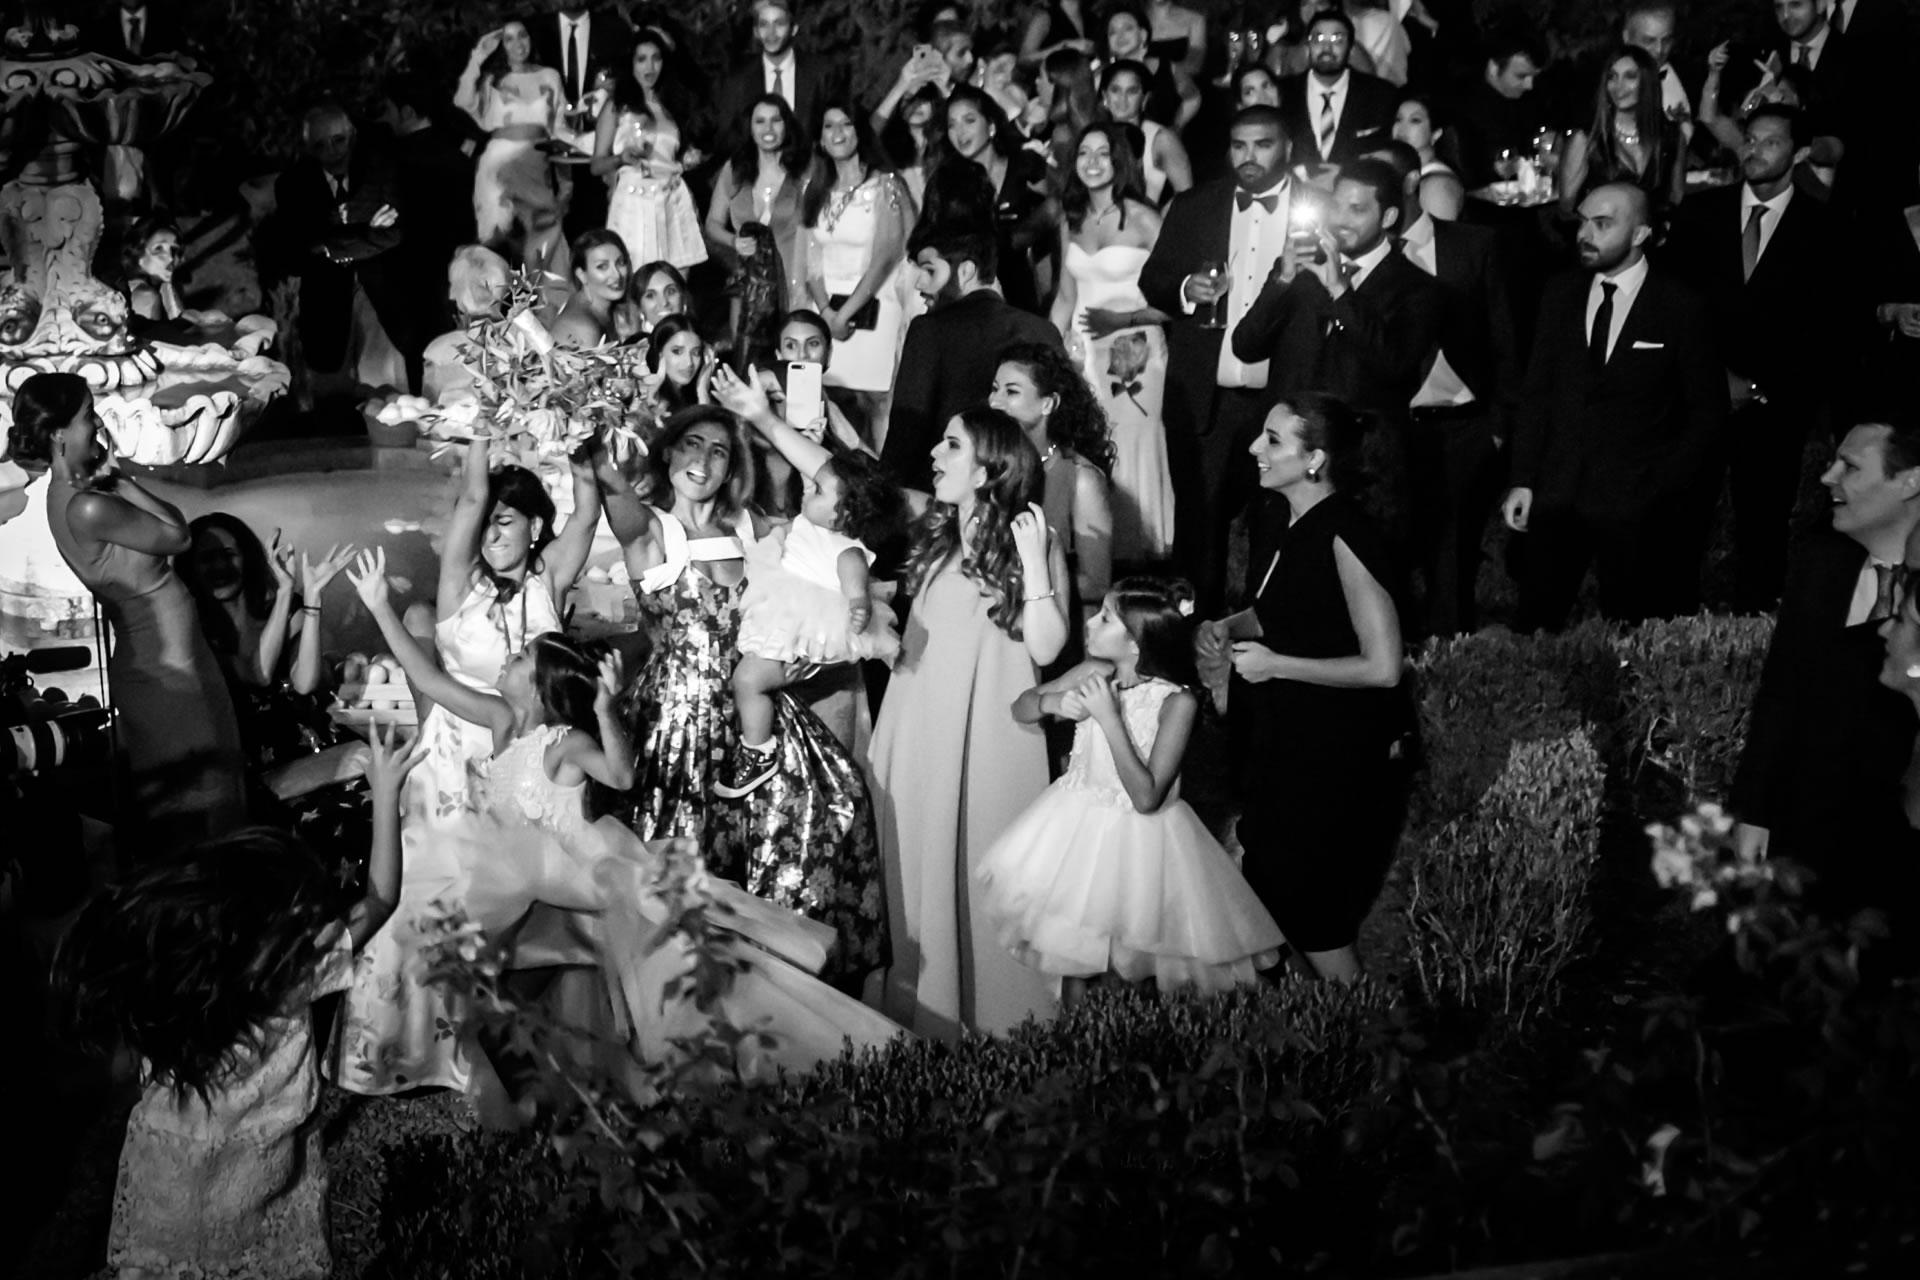 Bouquet - 43 :: Luxury wedding at Il Borro :: Luxury wedding photography - 42 :: Bouquet - 43